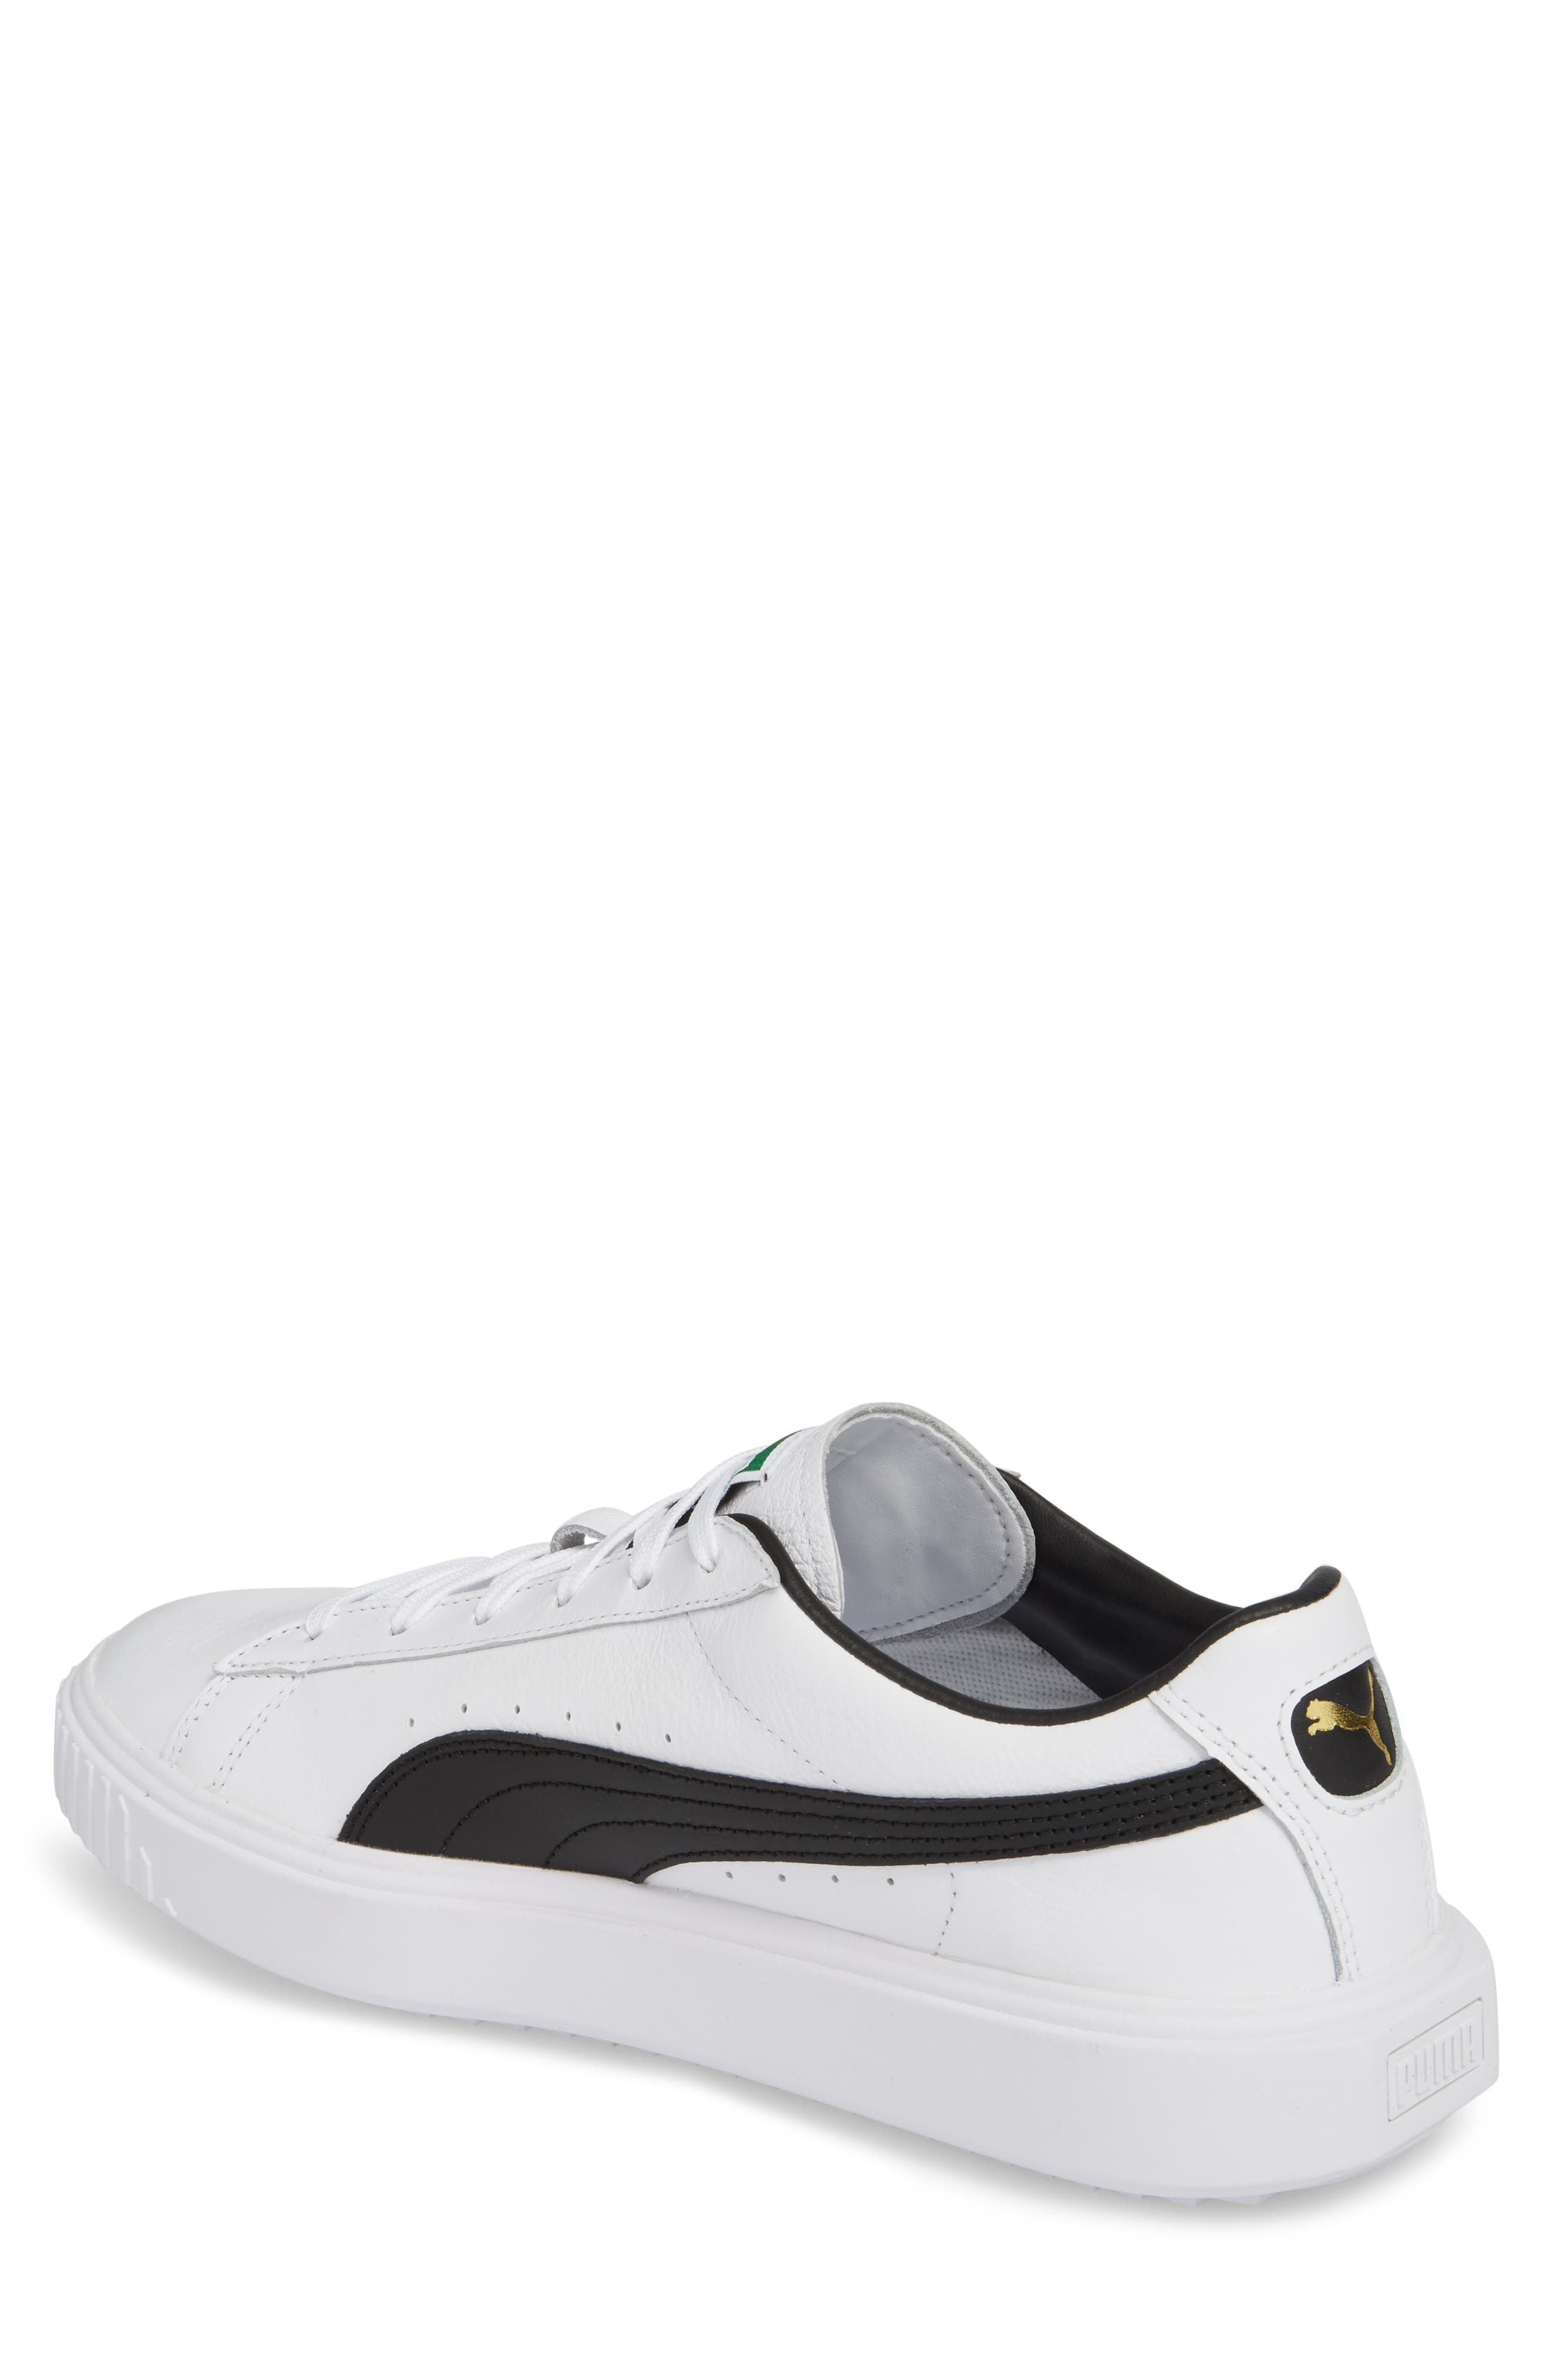 Breaker Low Top Sneaker,                             Alternate thumbnail 2, color,                             WHITE/ BLACK LEATHER